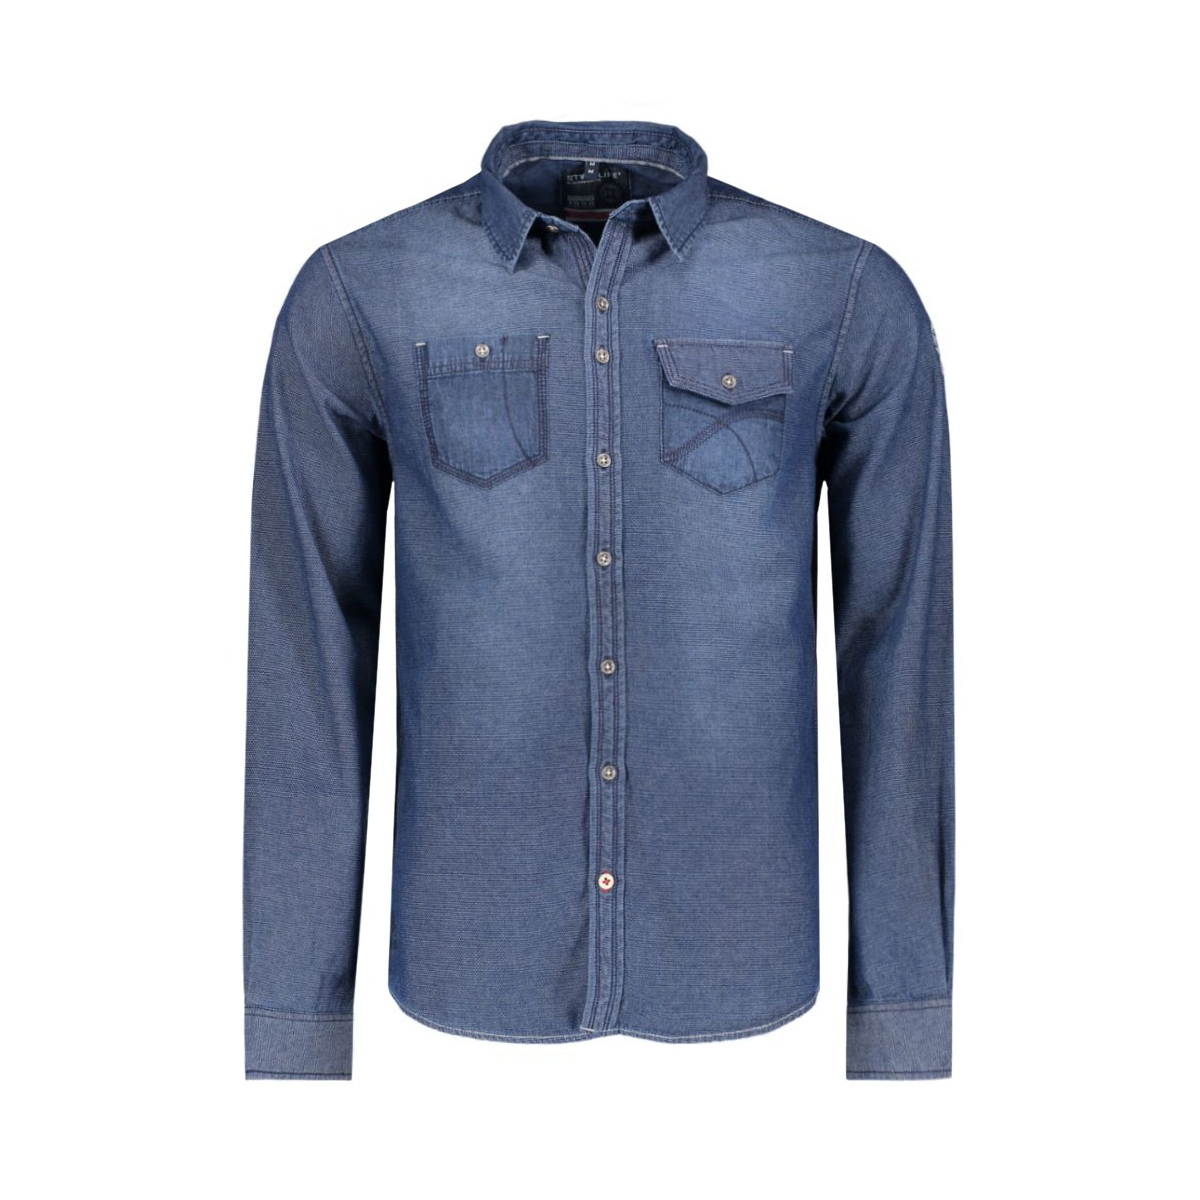 msh651633 twinlife overhemd 6550